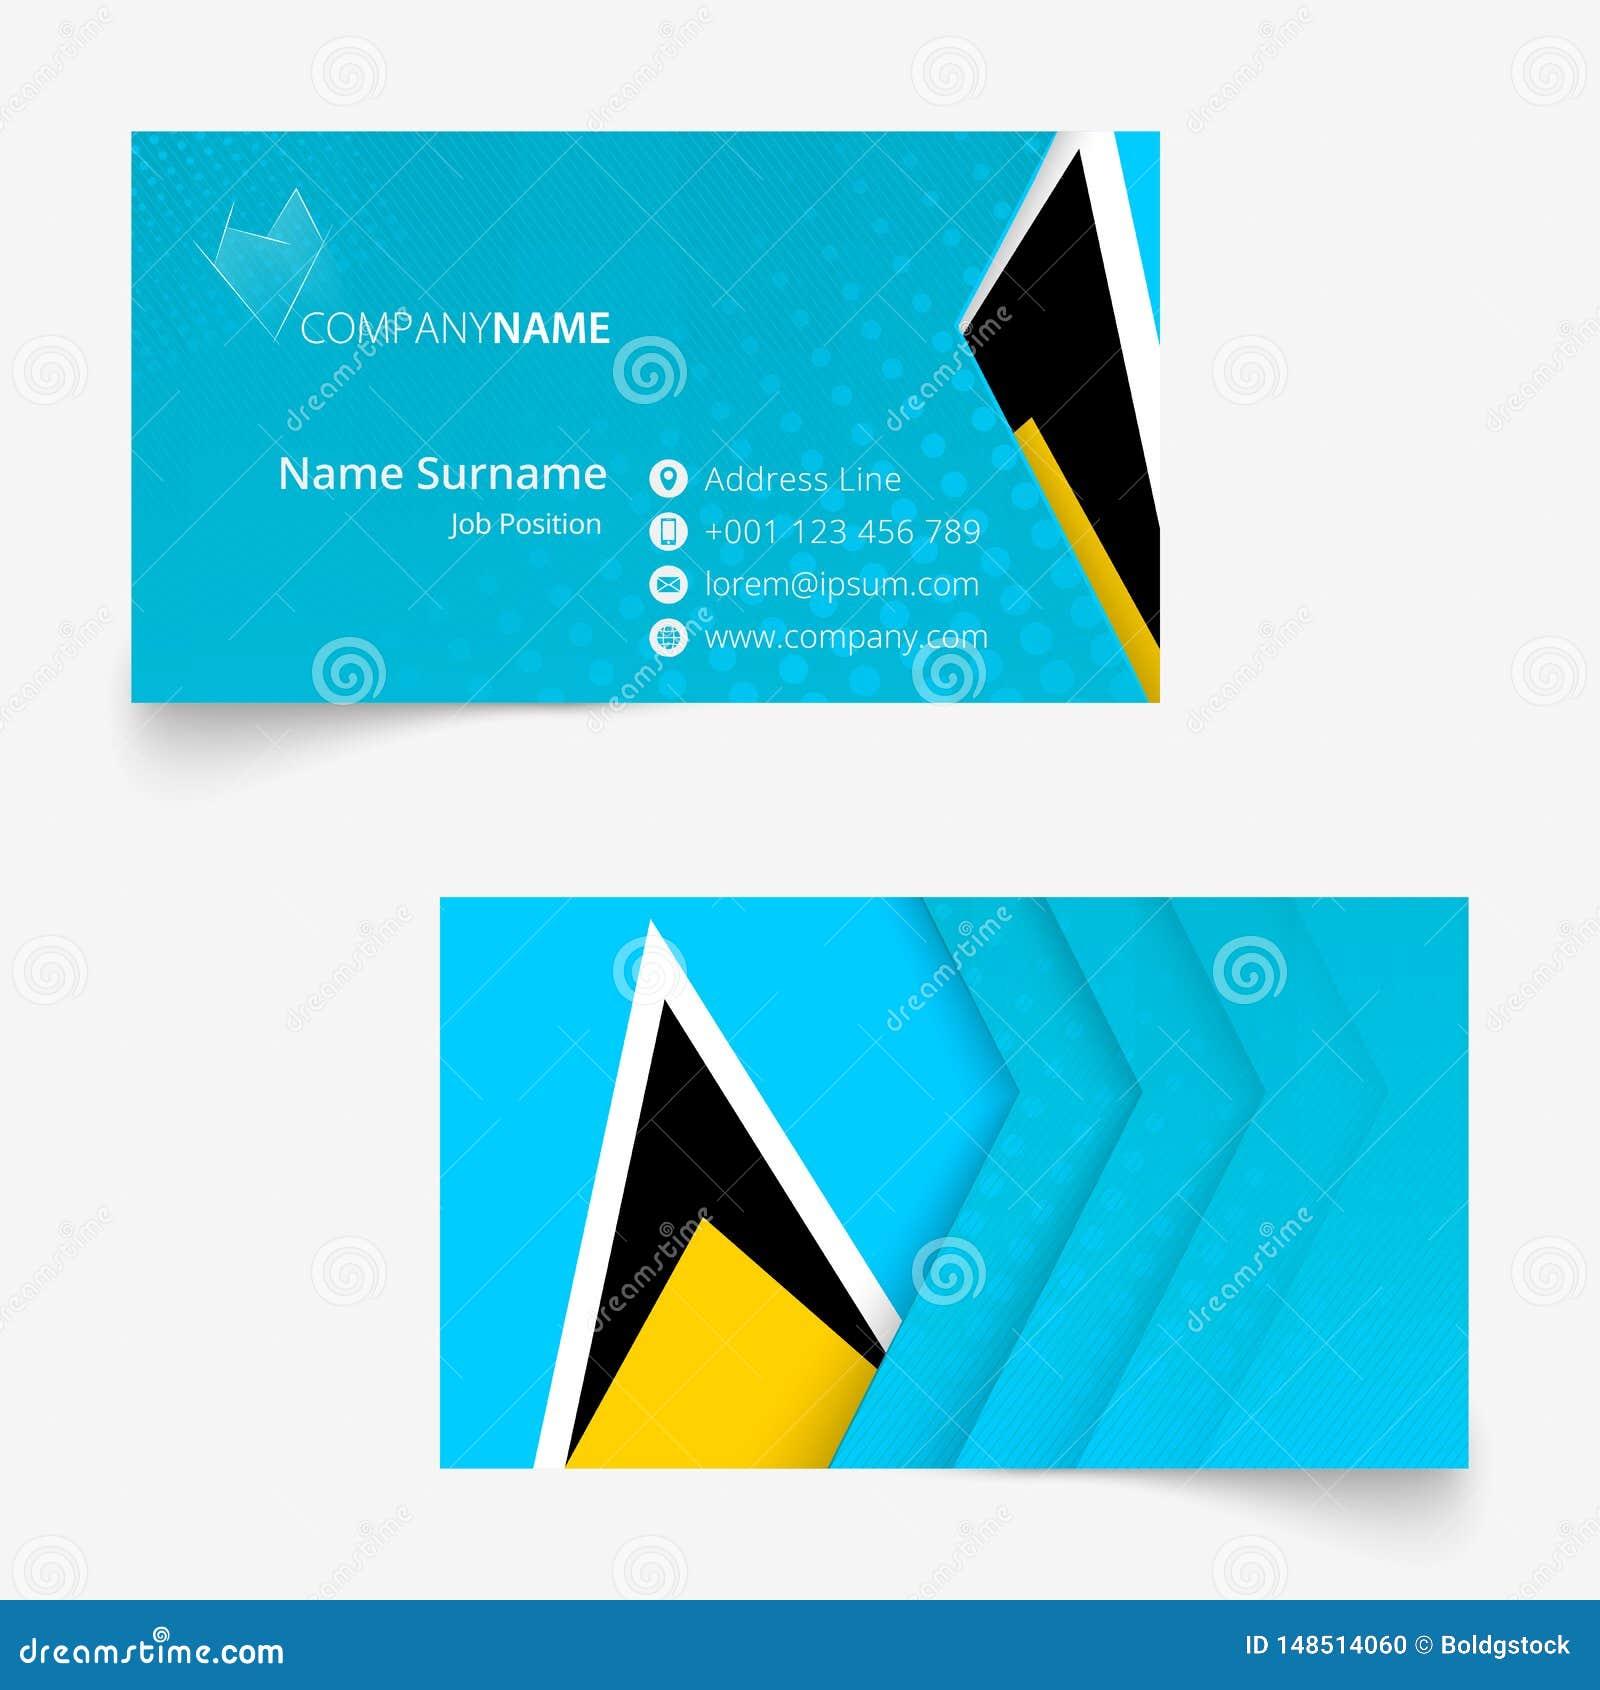 saint lucia flag business card standard size 90x50 mm